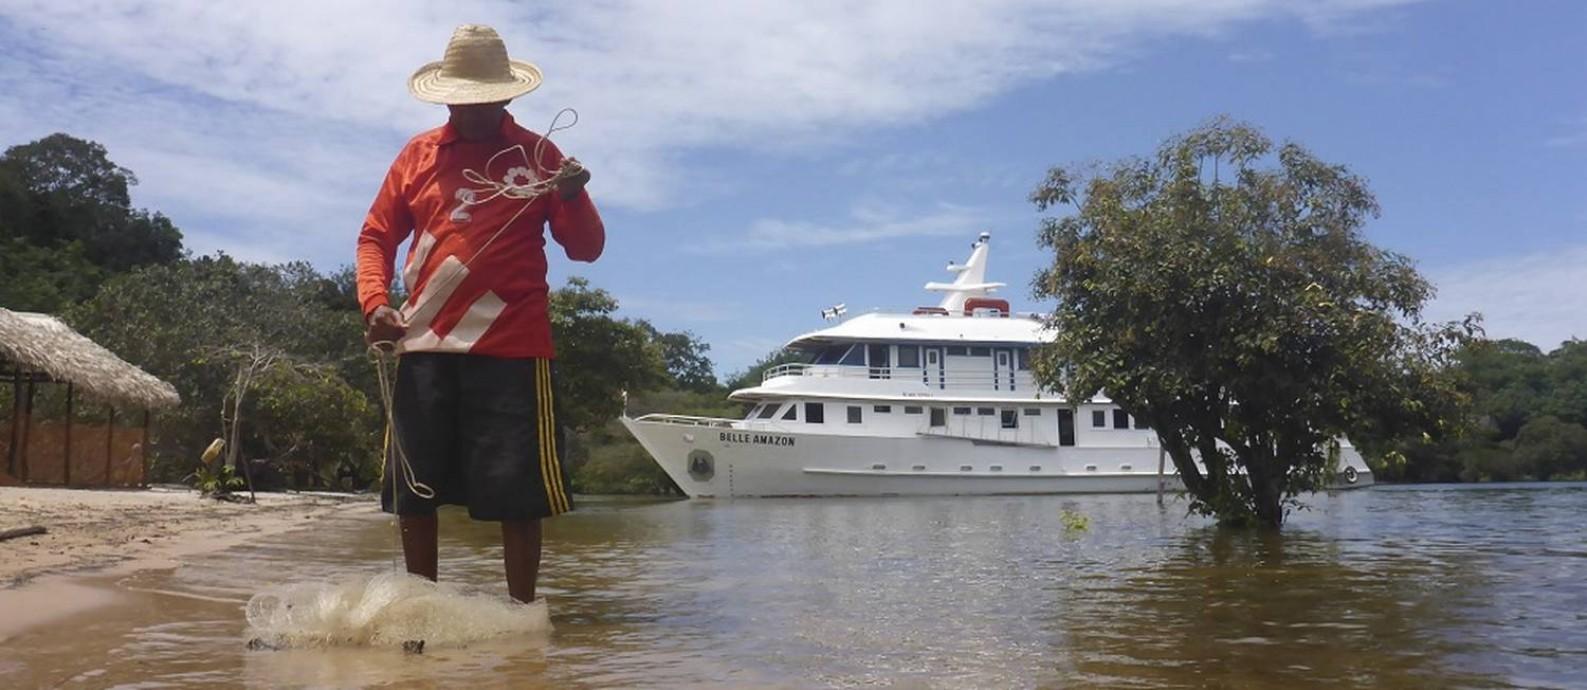 Pescador com o barco Belle Amazon ao fundo Foto: Gabriel de Paiva